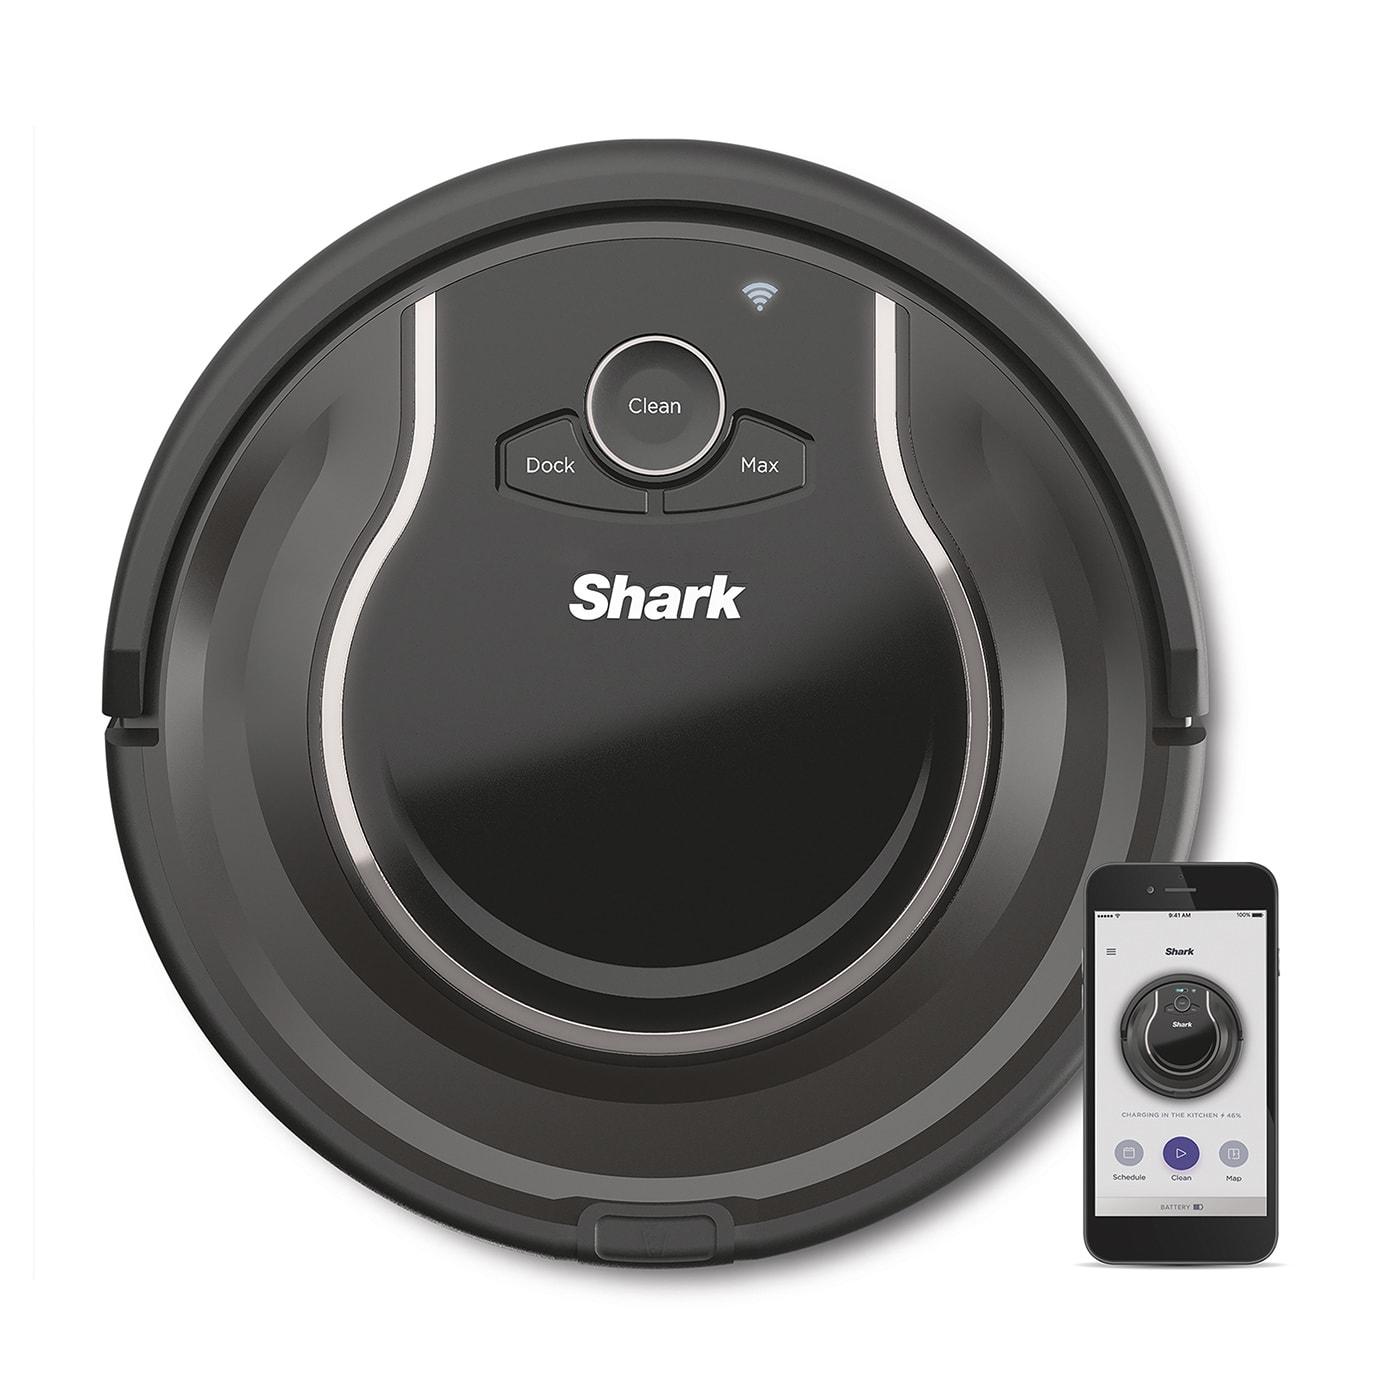 Shark ION Saugroboter - RV750L00EU - 2020 Modell Produktbild